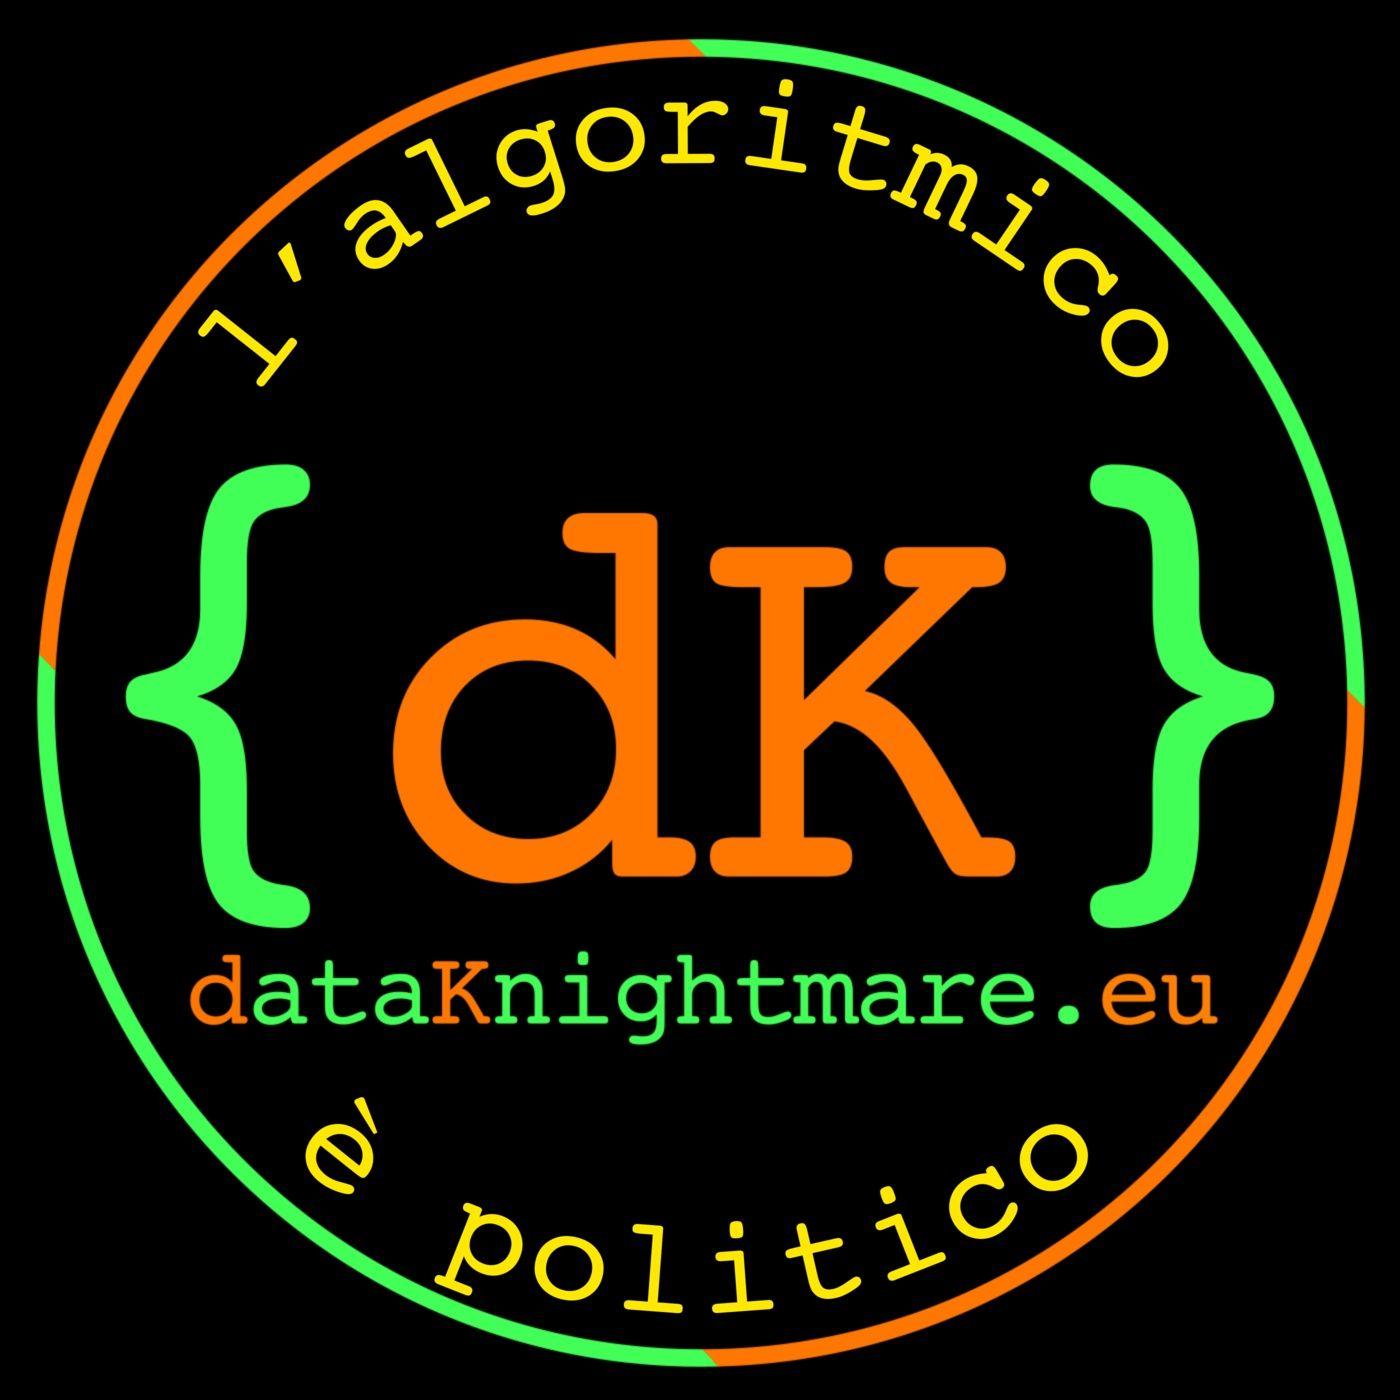 DK 5x34 - Bitcoinate